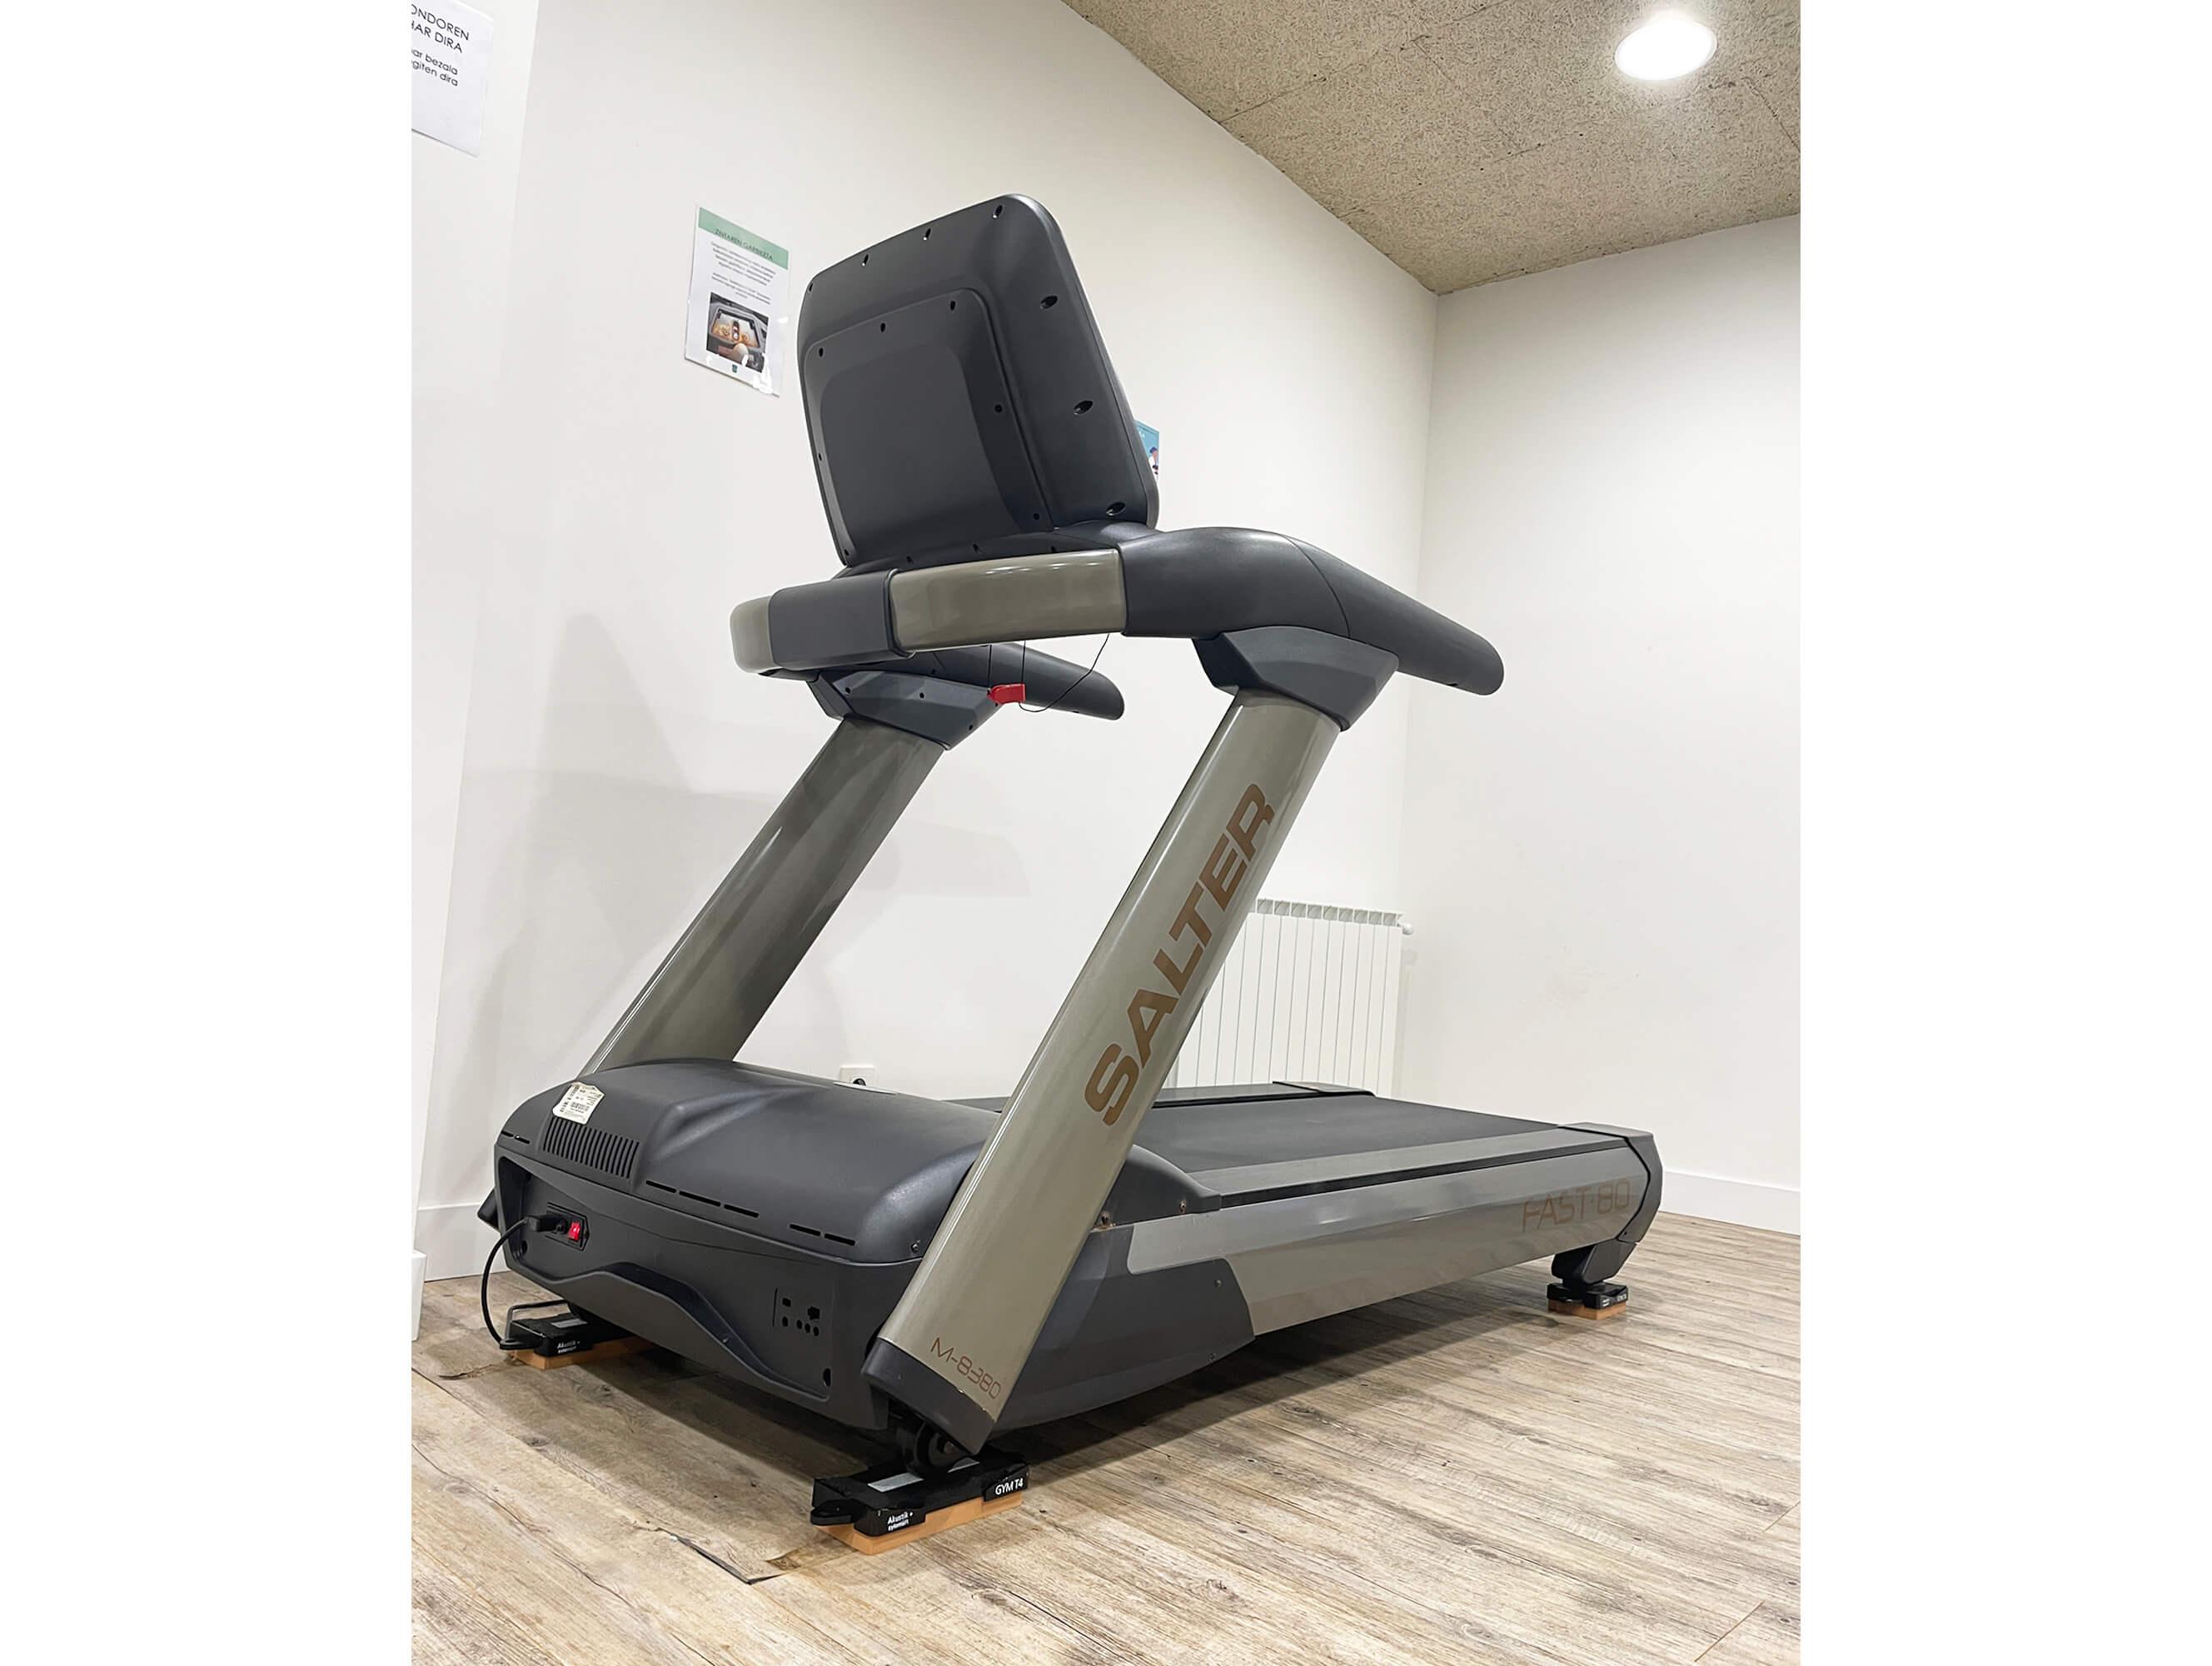 akustik-gym-t4-4.jpg